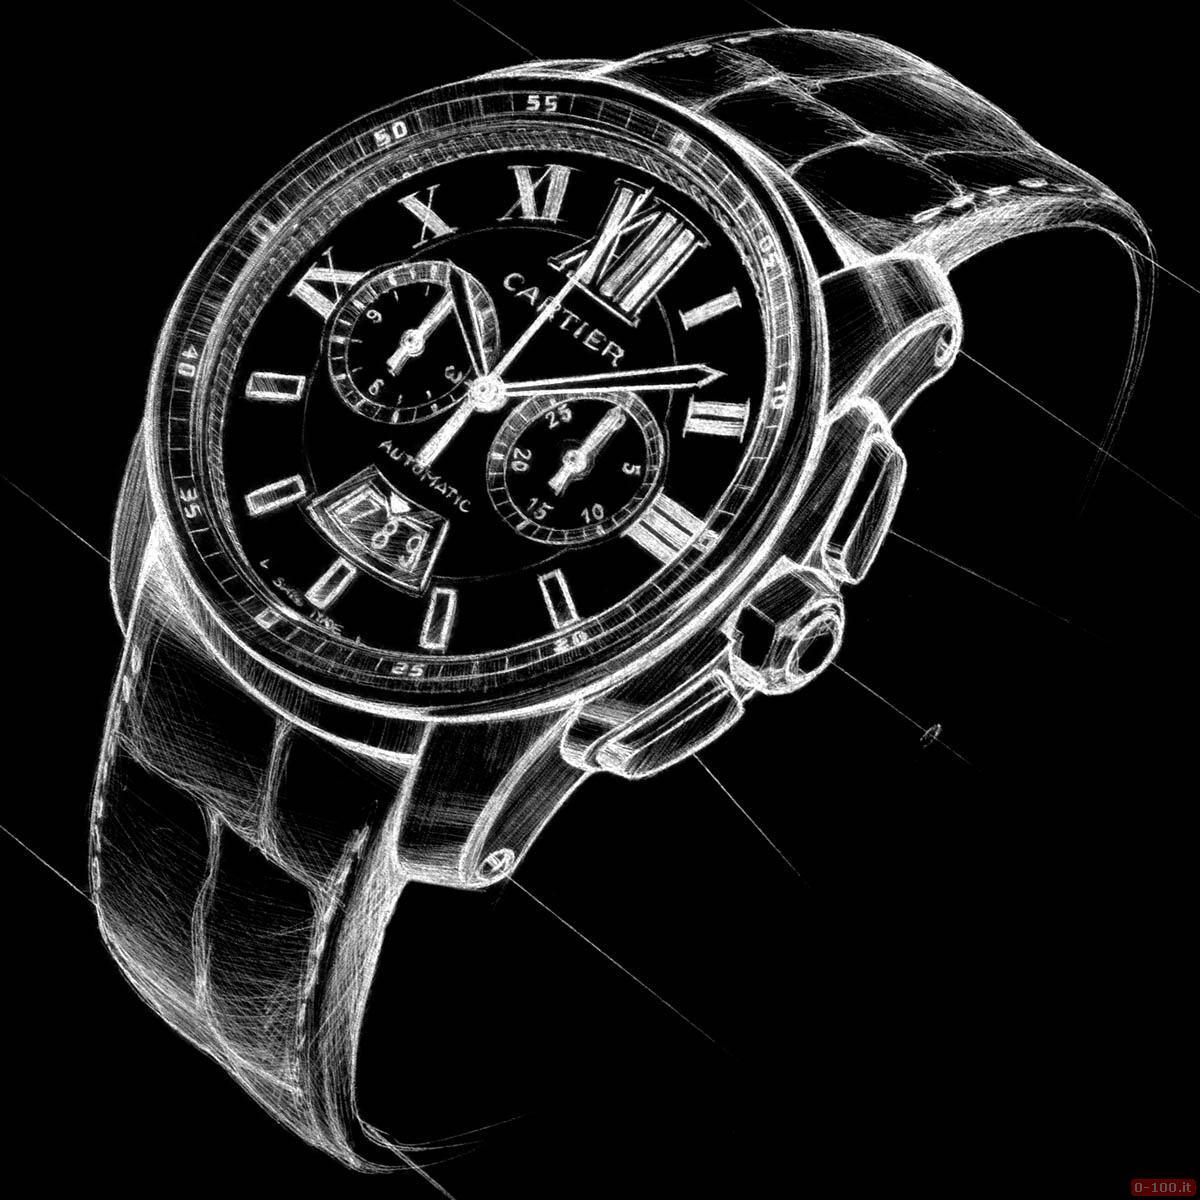 Cartier Calibre Chronograph Watch _0-1001